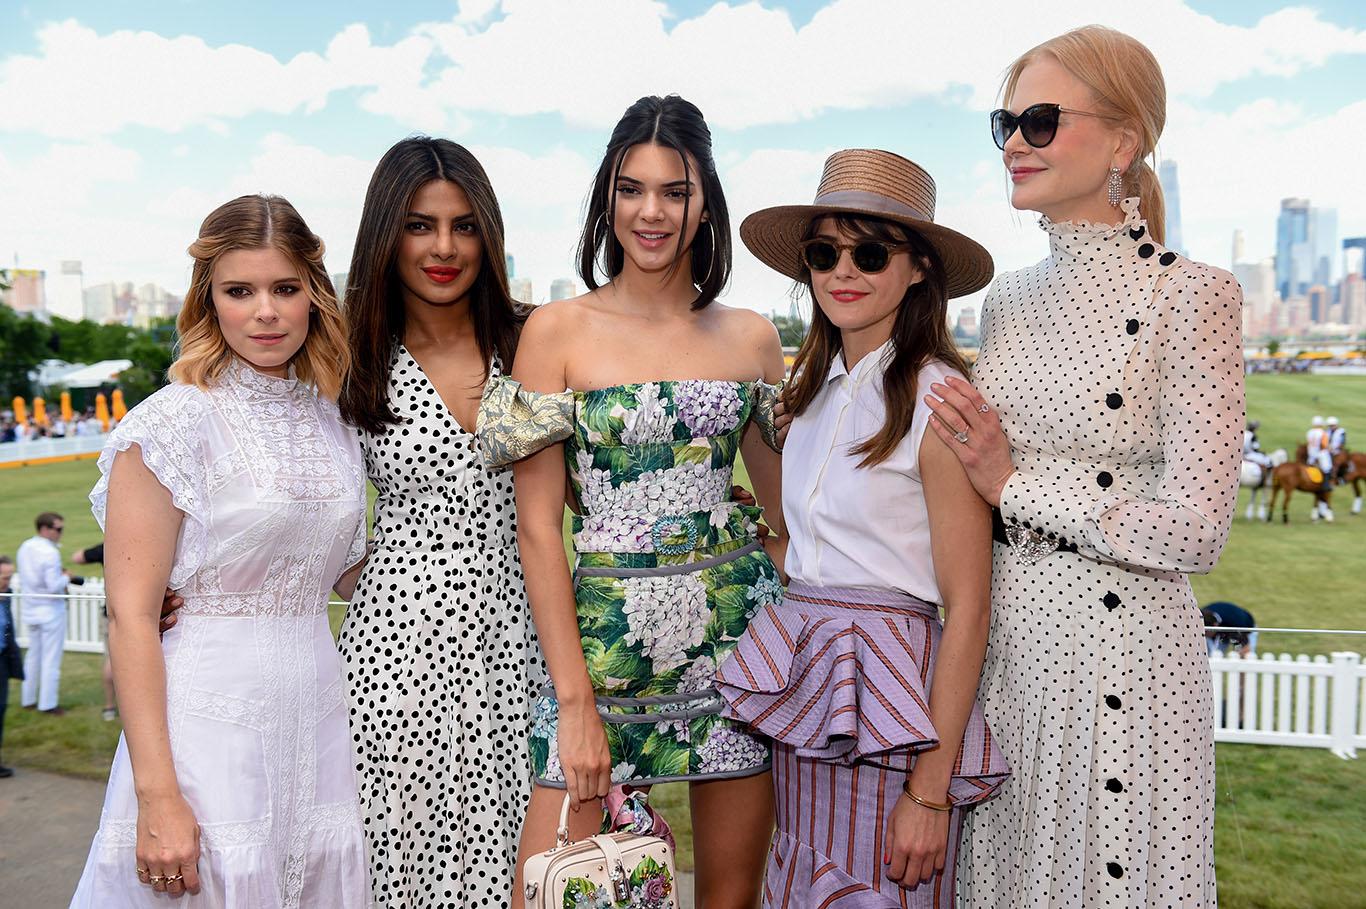 Kate Mara, Priyanka Chopra, Kendall Jenner, Keri Russell, Nicole Kidman